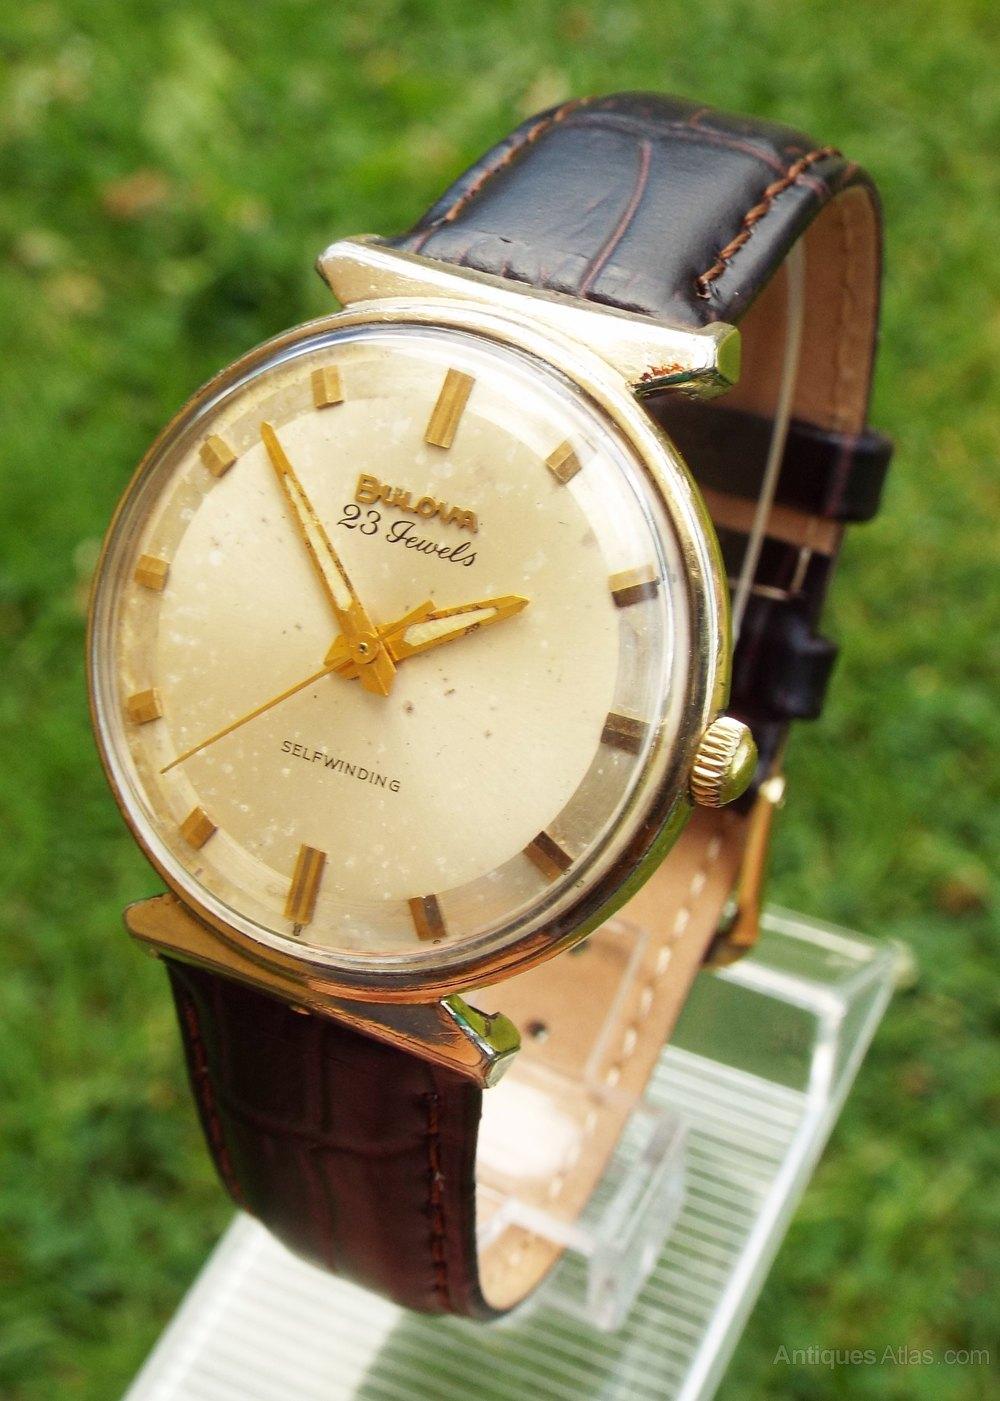 Antiques Atlas - 1963 Gents Bulova Automatic Wrist Watch